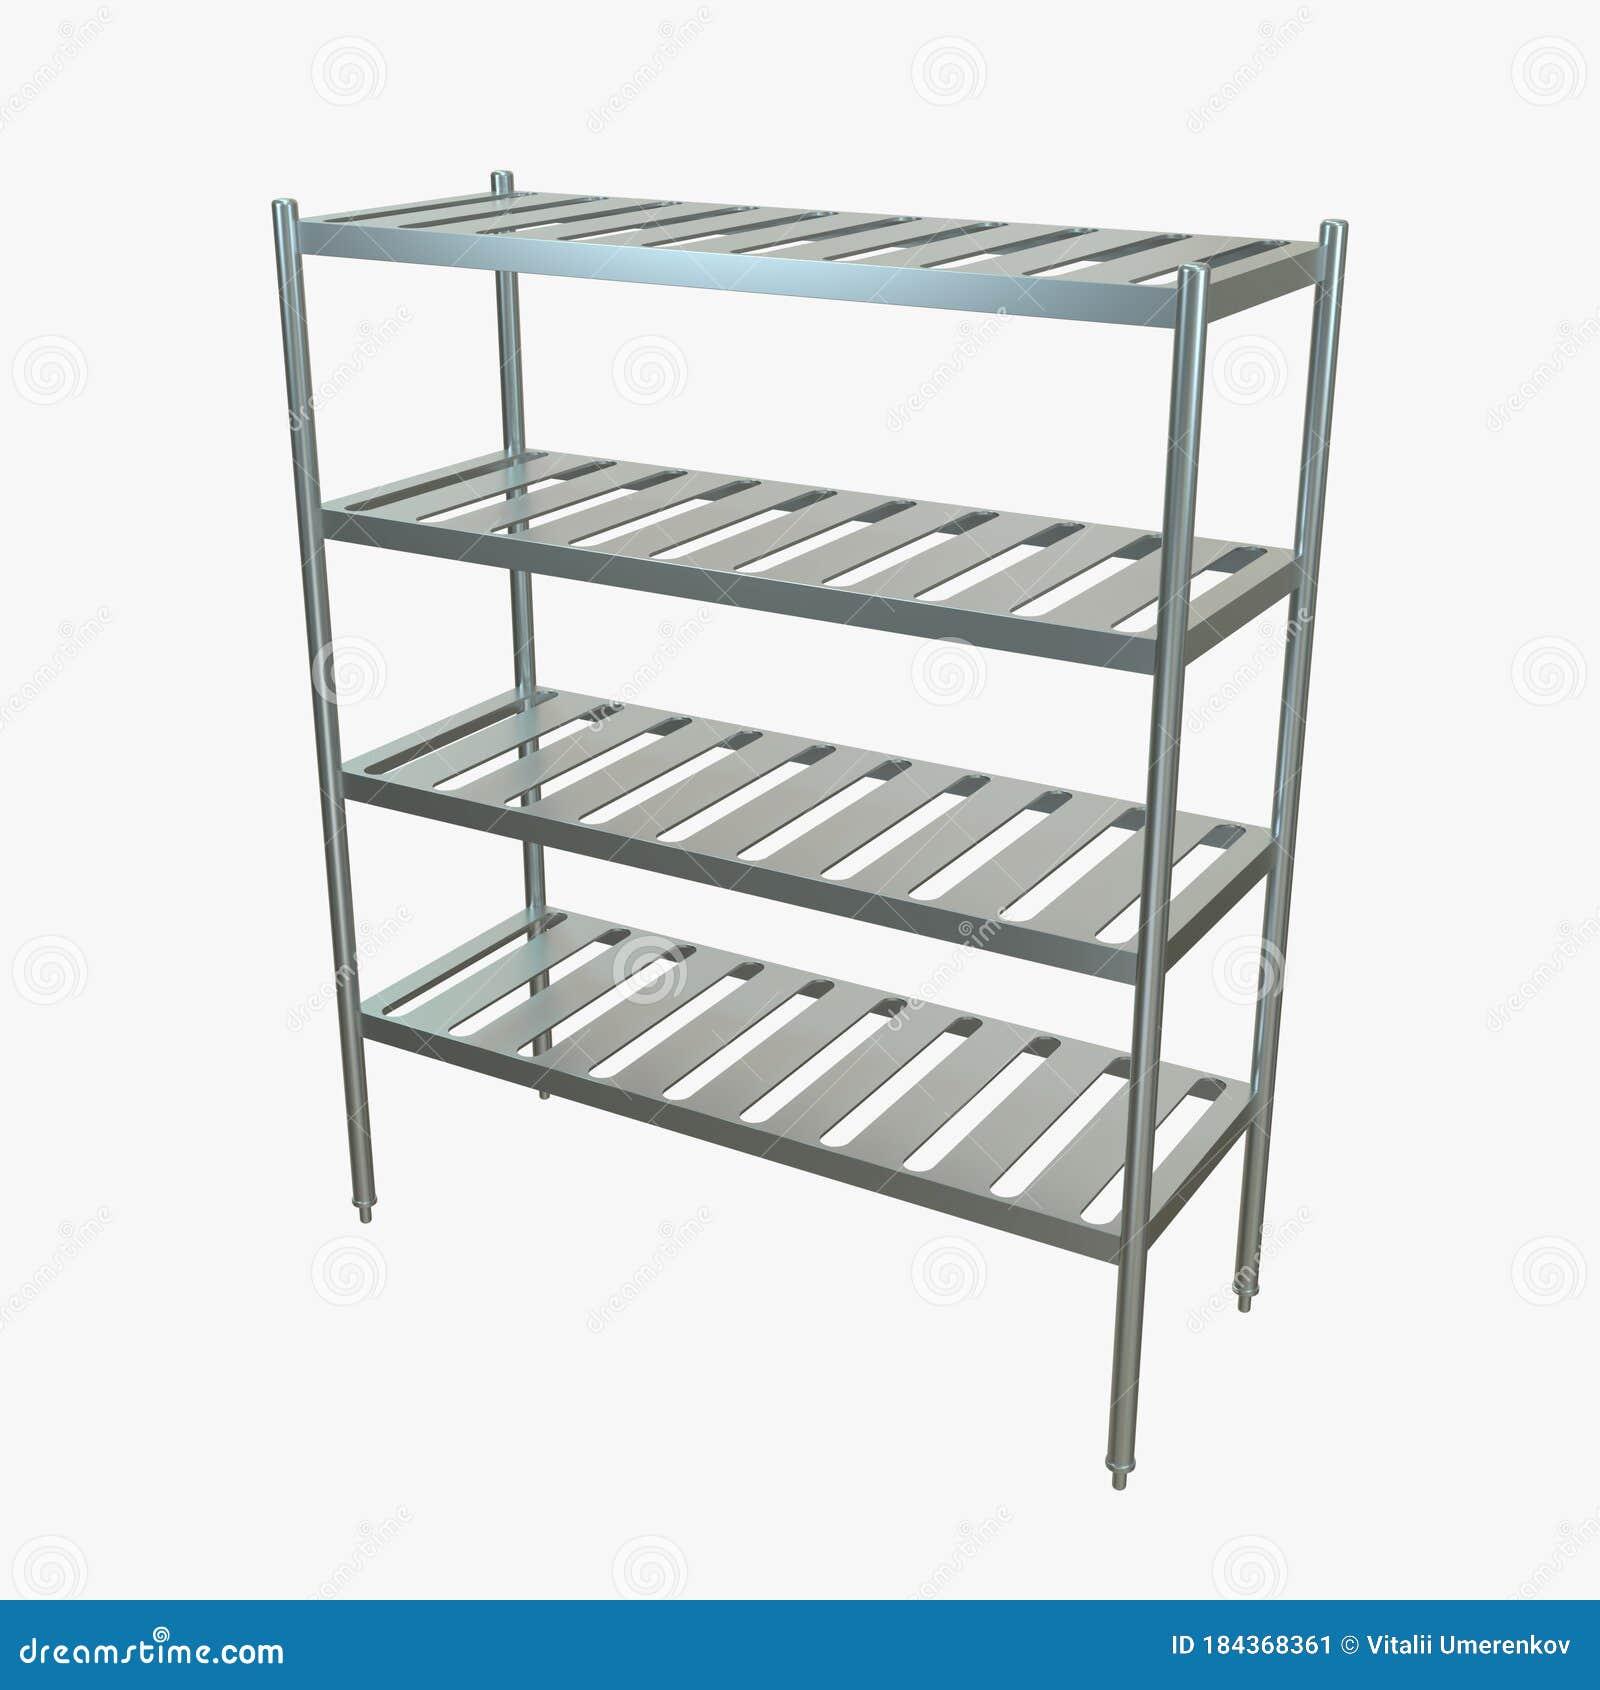 Picture of: Metal Kitchen Rack Kitchen Storage Stock Image Illustration Of Metal Shelving 184368361